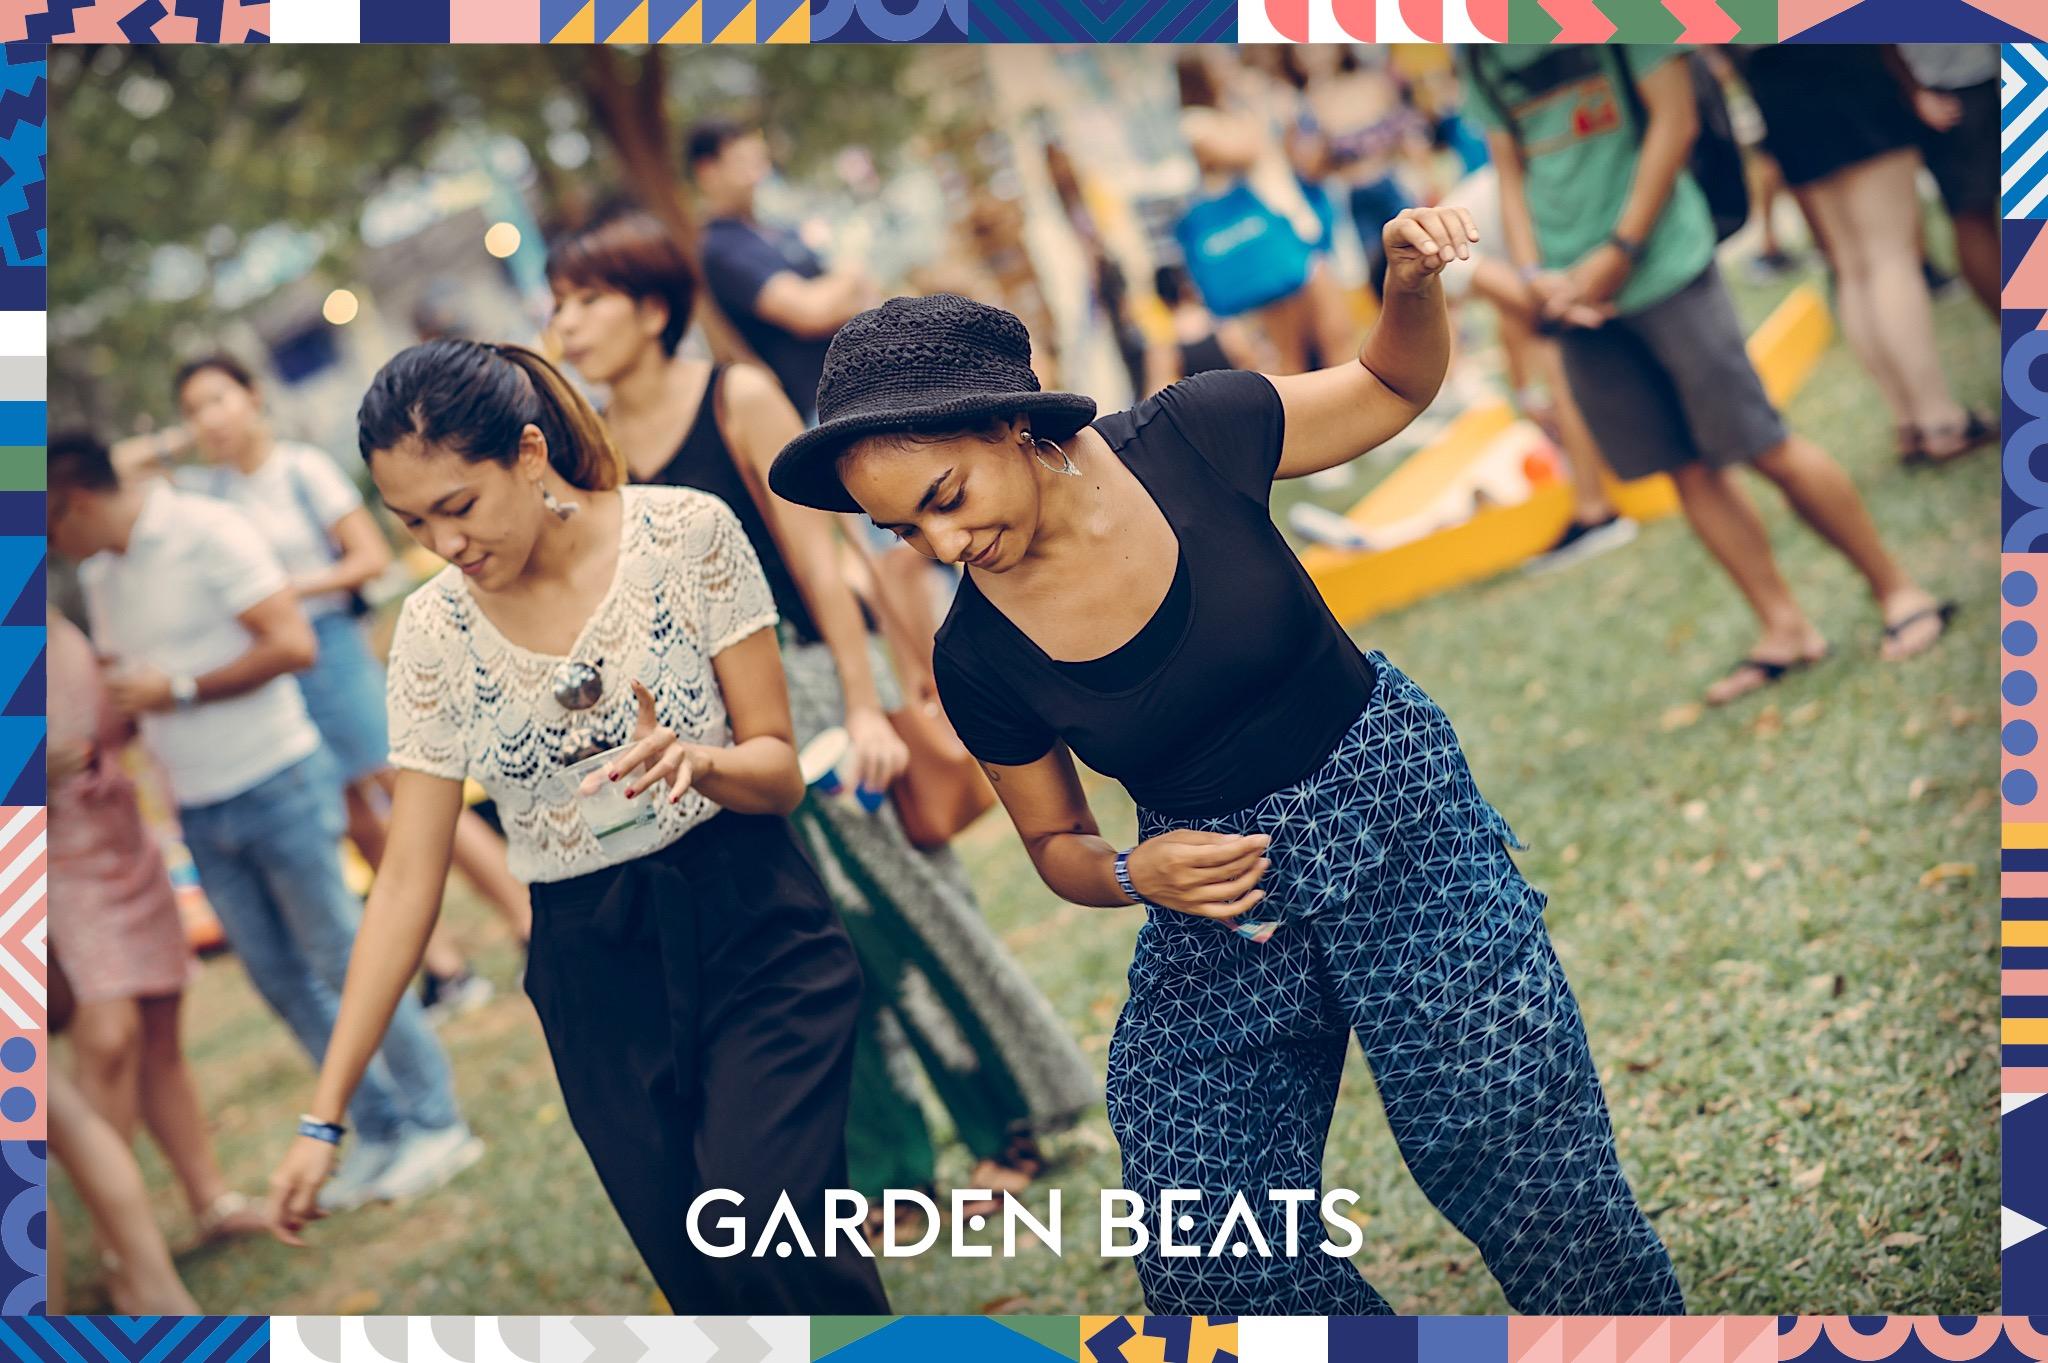 03032018_GardenBeats_Colossal362_Watermarked.jpg